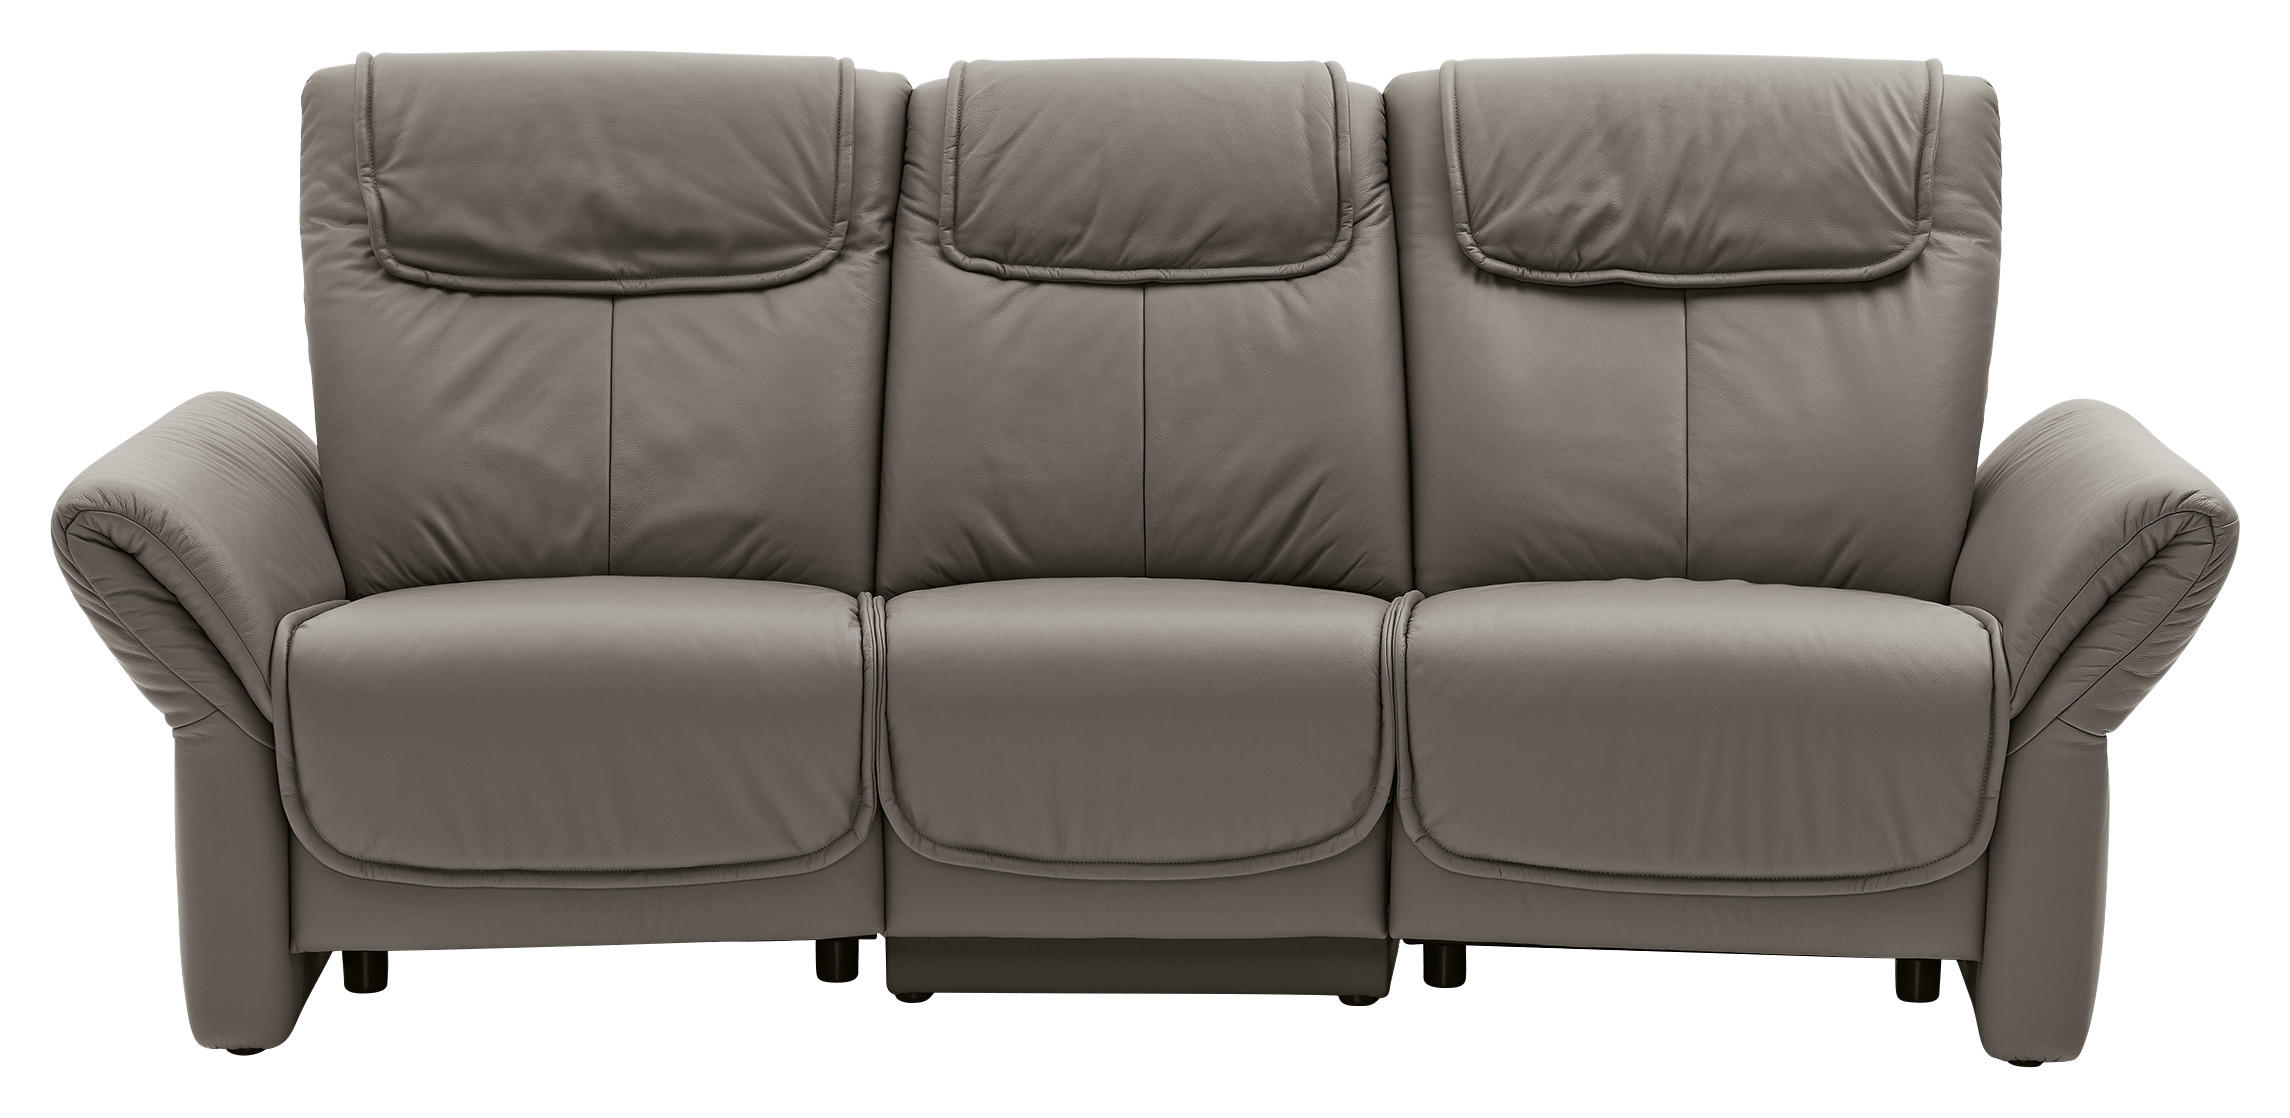 Musterring Heimkino Sofa Grau Mit Leder Entdecken